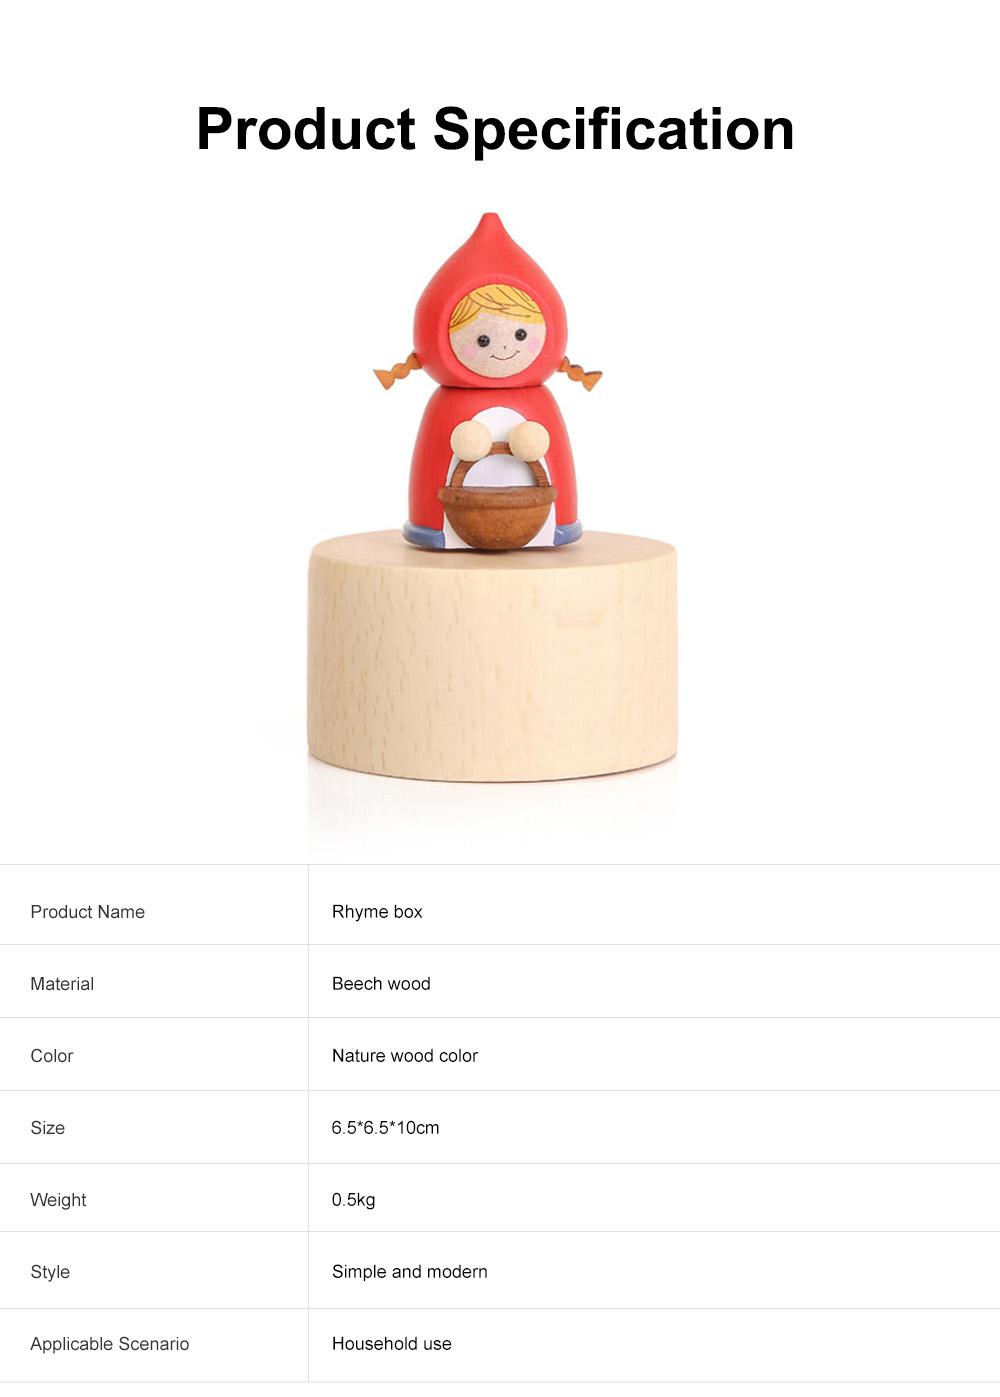 Wood Rhyme Box Mini Lovely Cartoon Design Manual Rotating Music Box Small Size Decorative Handiwork Gift for Children Family Lovers 5